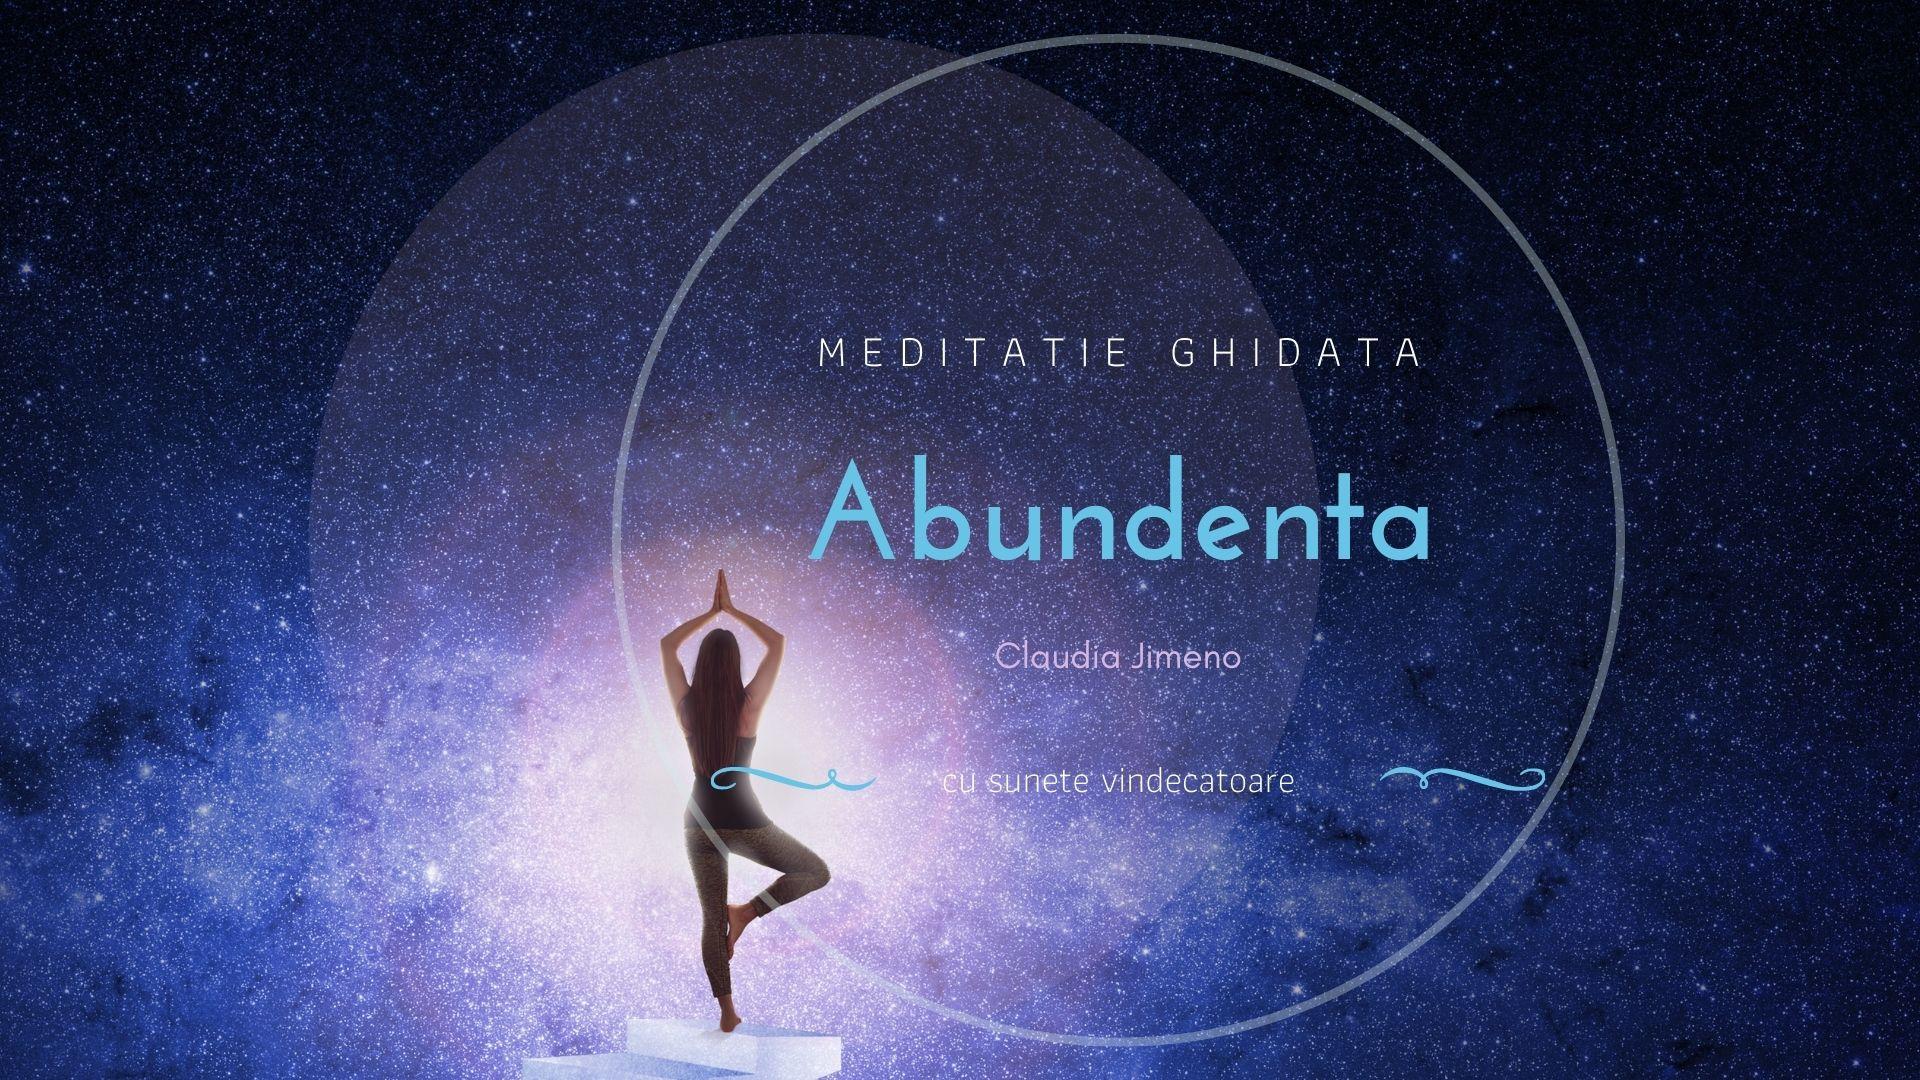 Meditatie ghidata abundenta